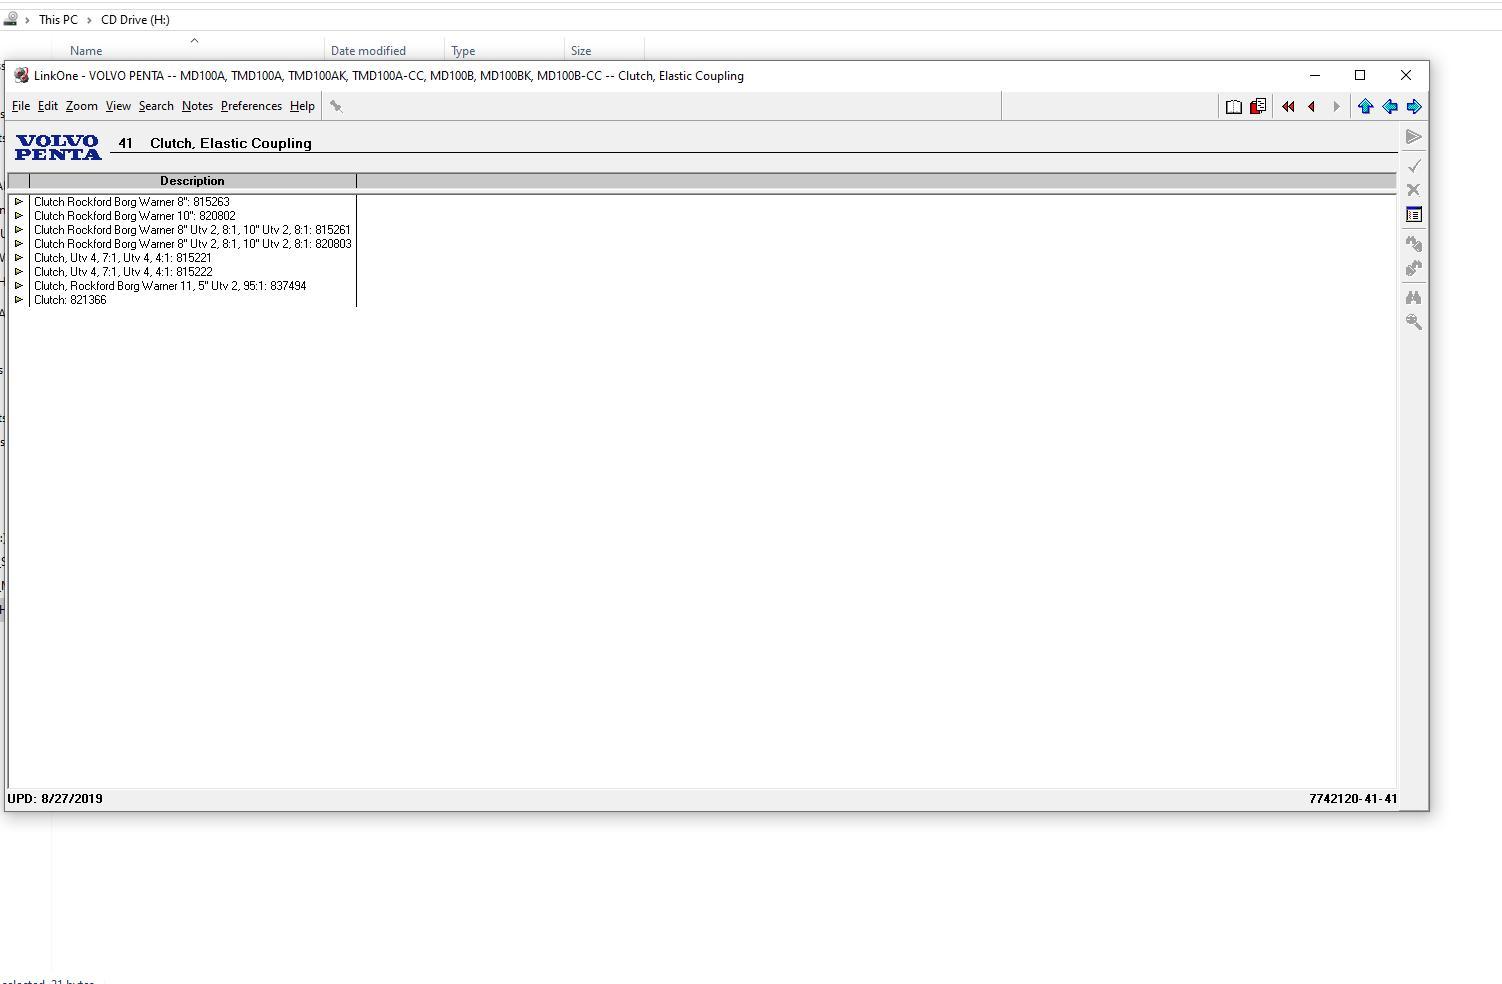 Volvo_Penta_EPC_112019_Marine_and_Industrial_Engine_Spare_Part_Catalog6